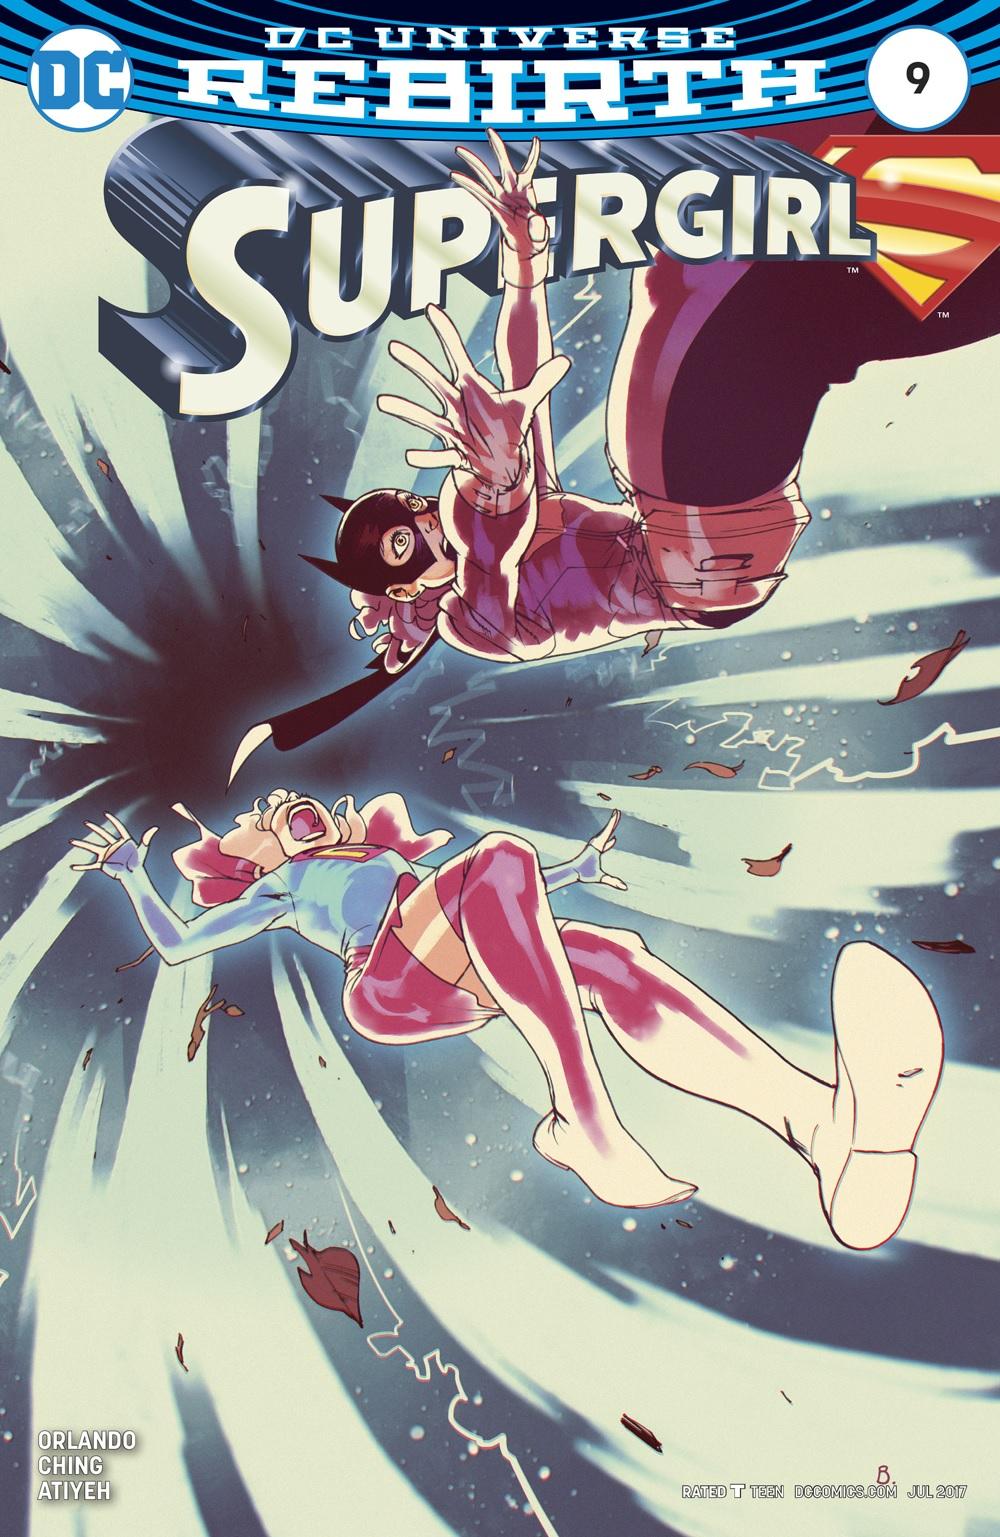 Supergirl Vol 7 9 Variant.jpg